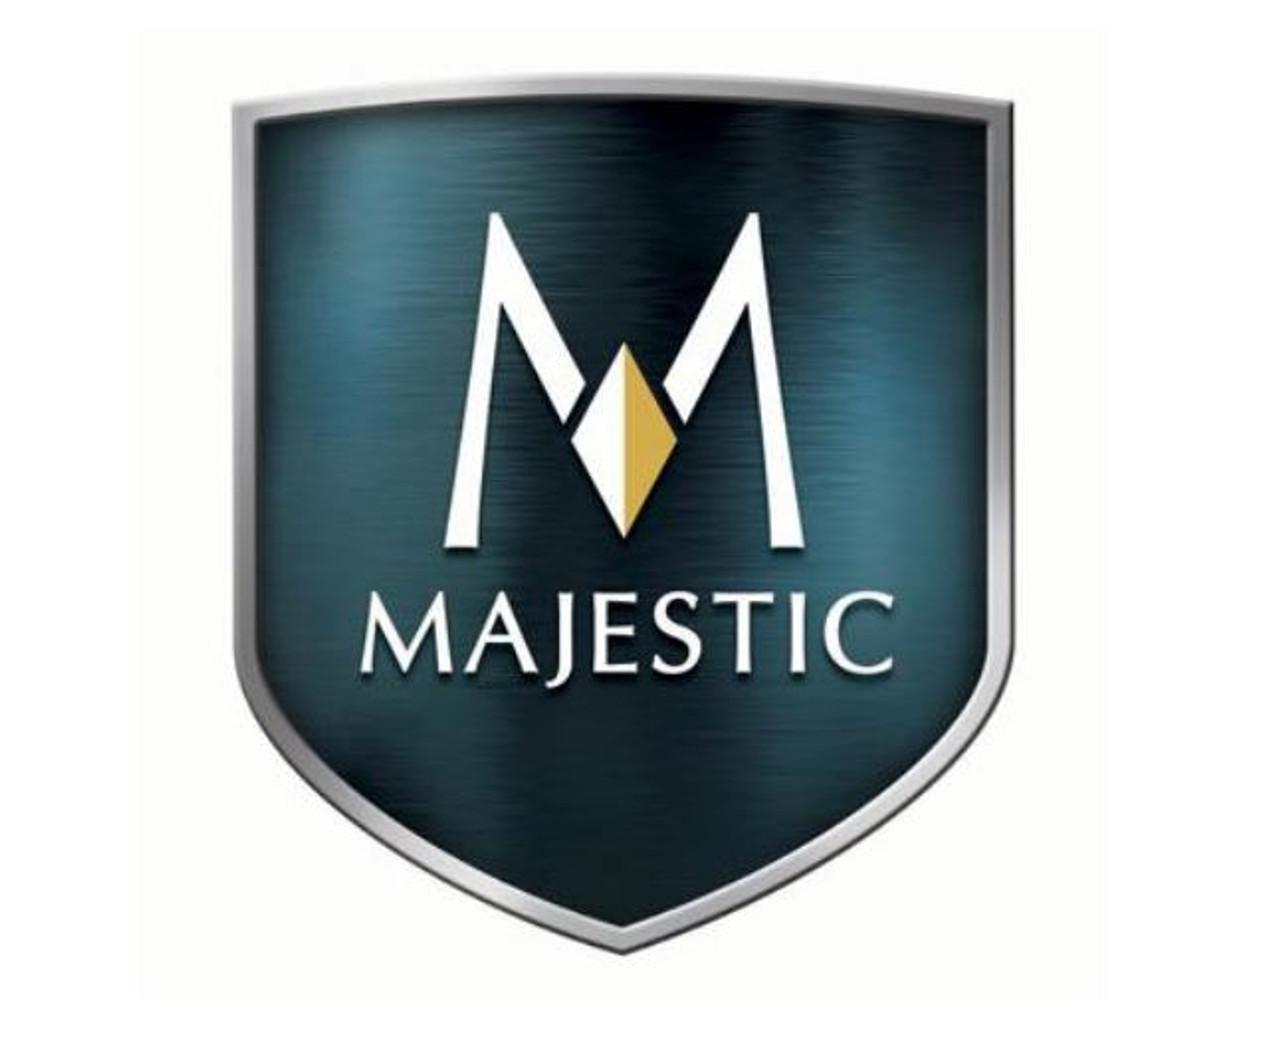 "Majestic  48"" Length Round Rigid Pipe - 6GV48 (Gas Fireplace - 6"" B-Vent)"